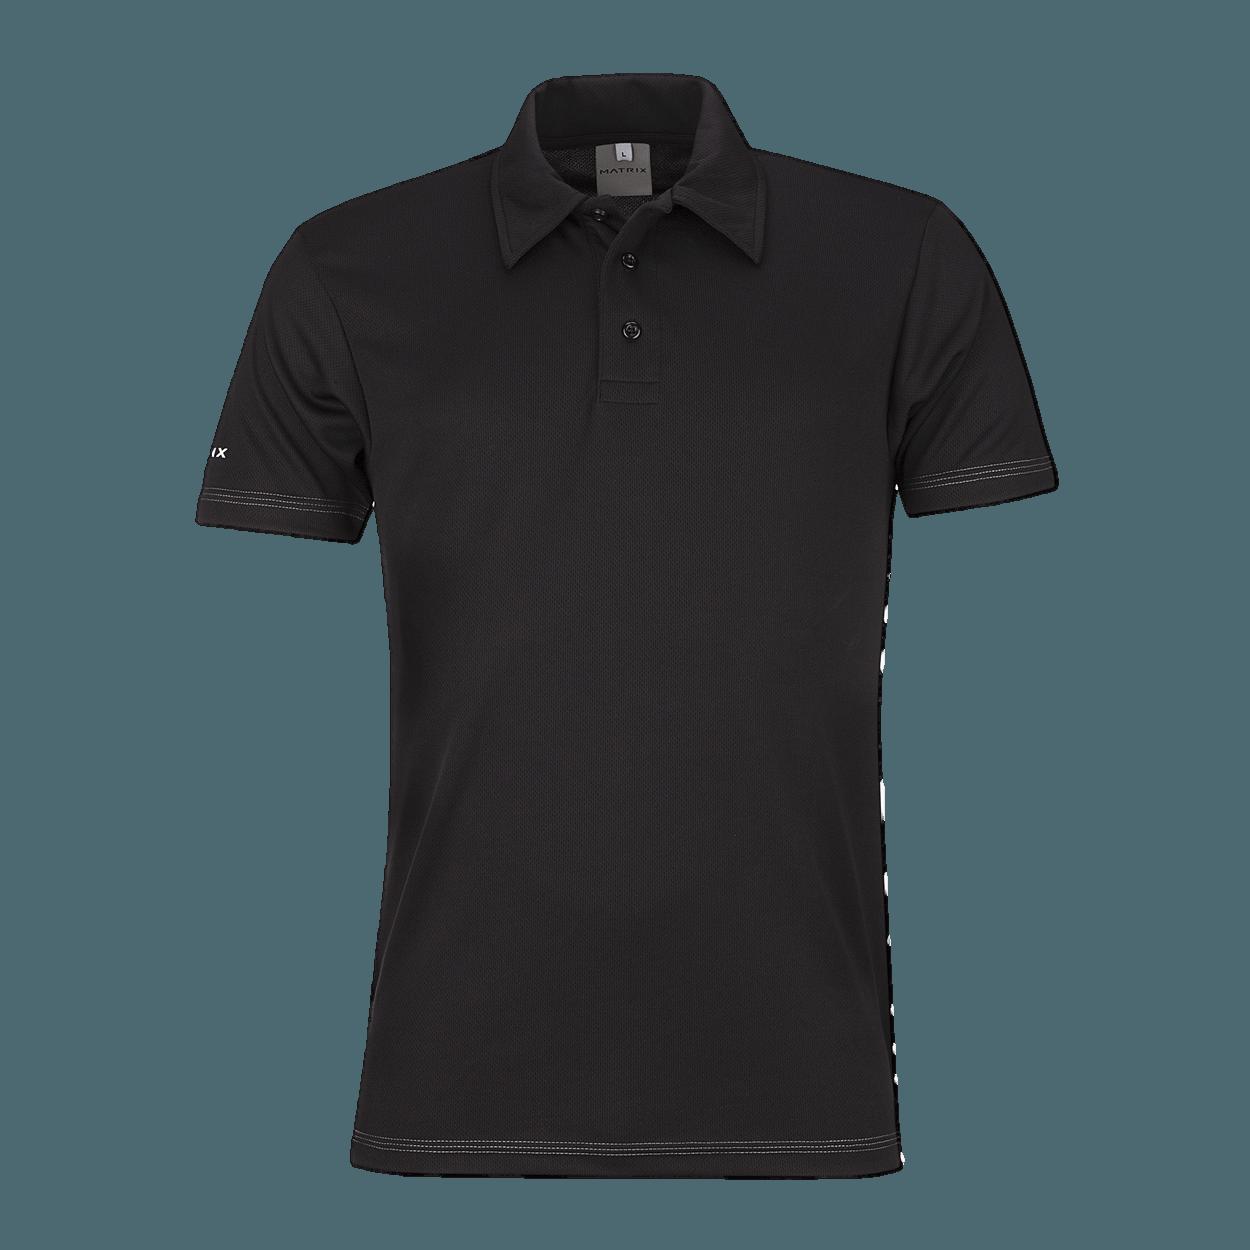 Black Polo Shirt Png Image Png Image - Polo Shirt, Transparent background PNG HD thumbnail